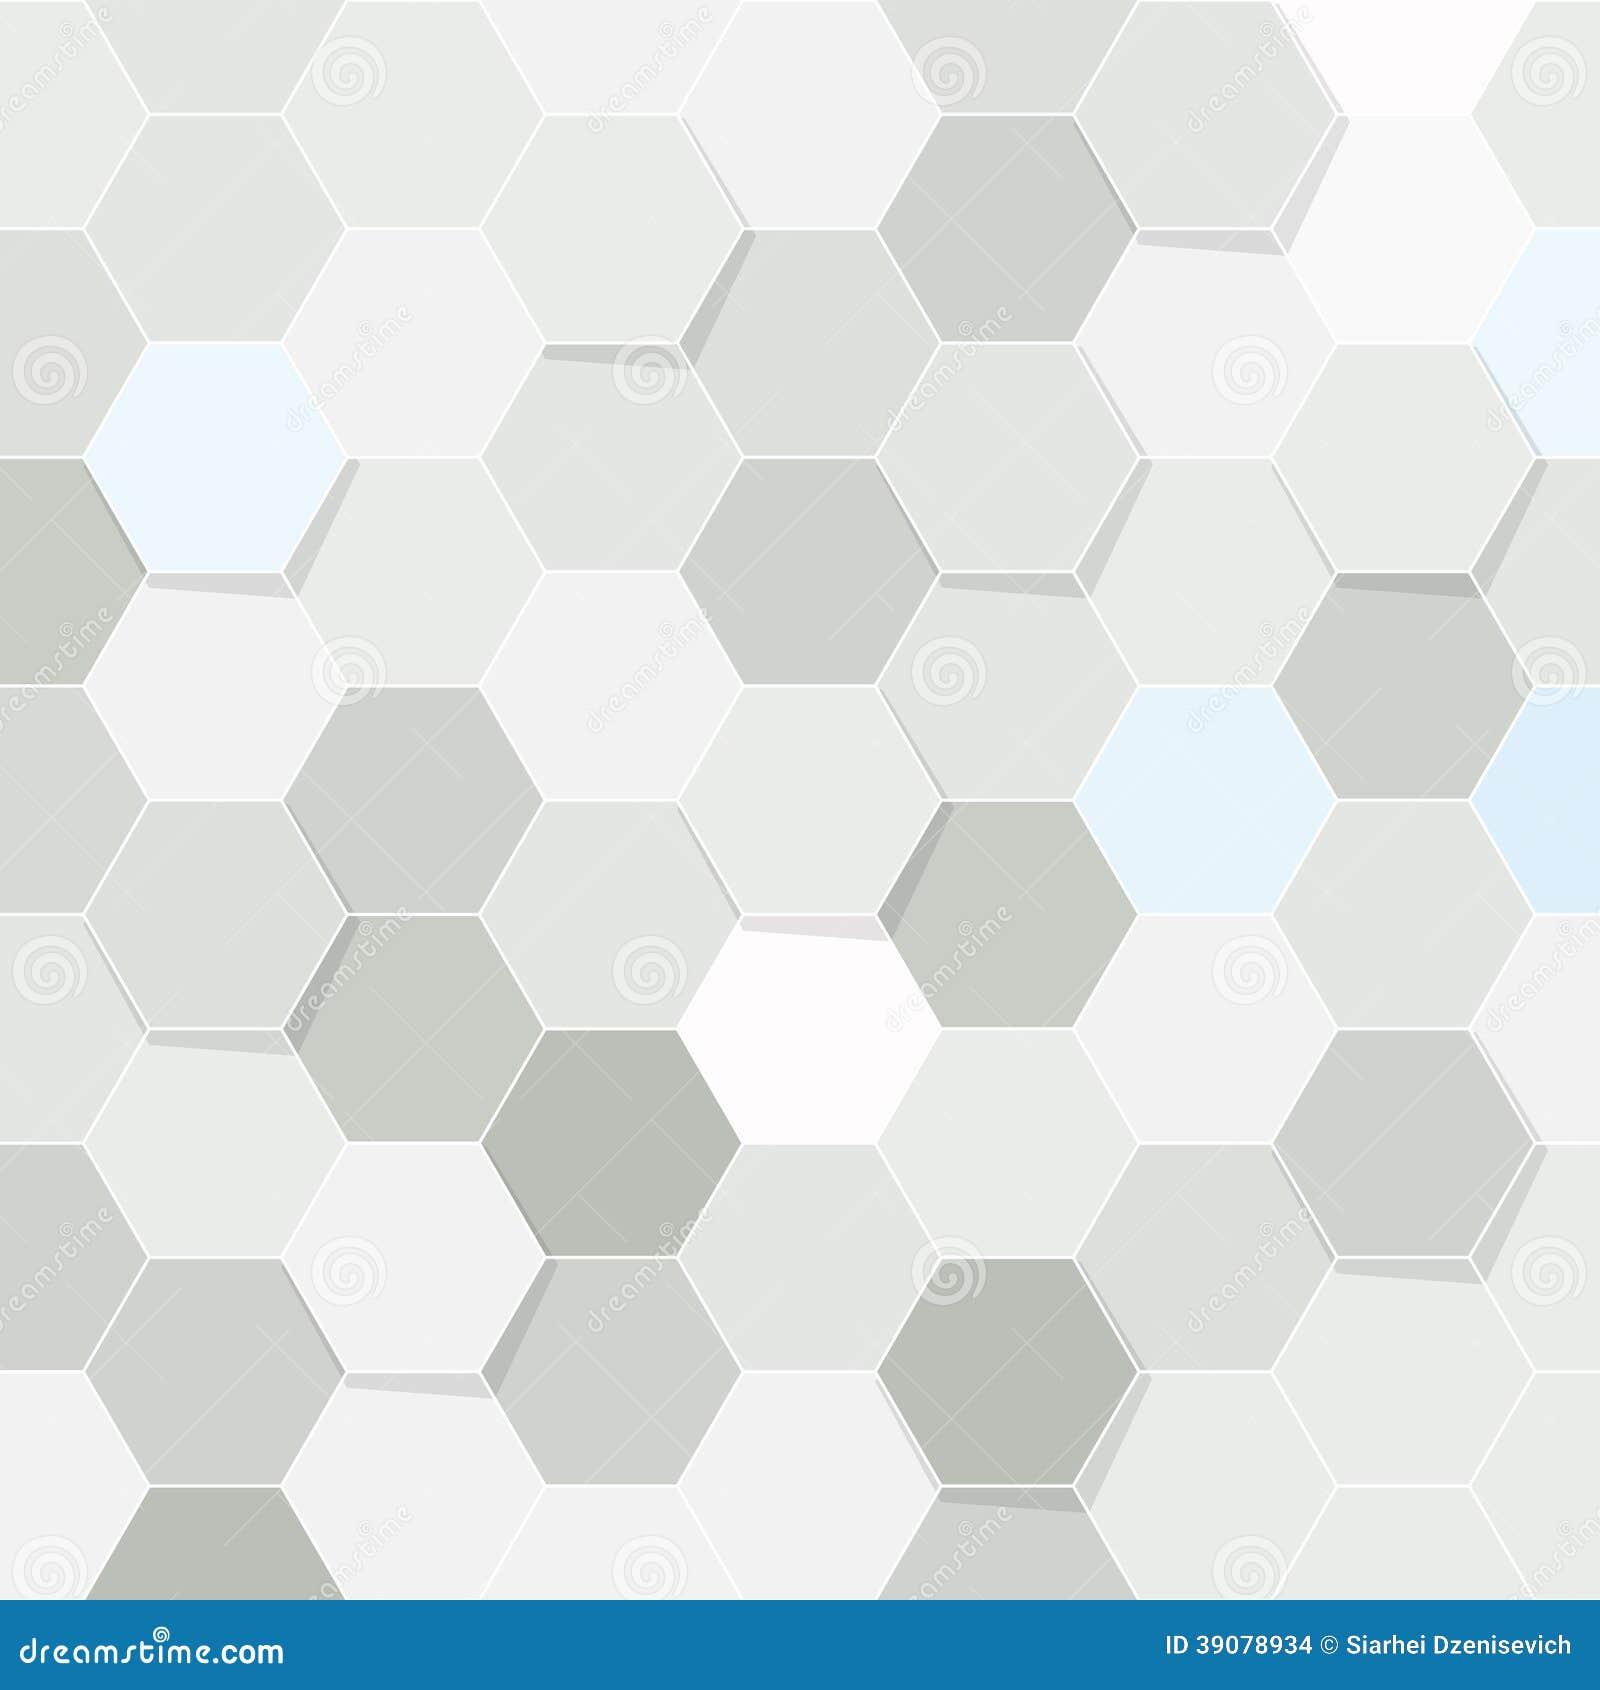 Hexagon Tile Transparent Background Stock Vector Image